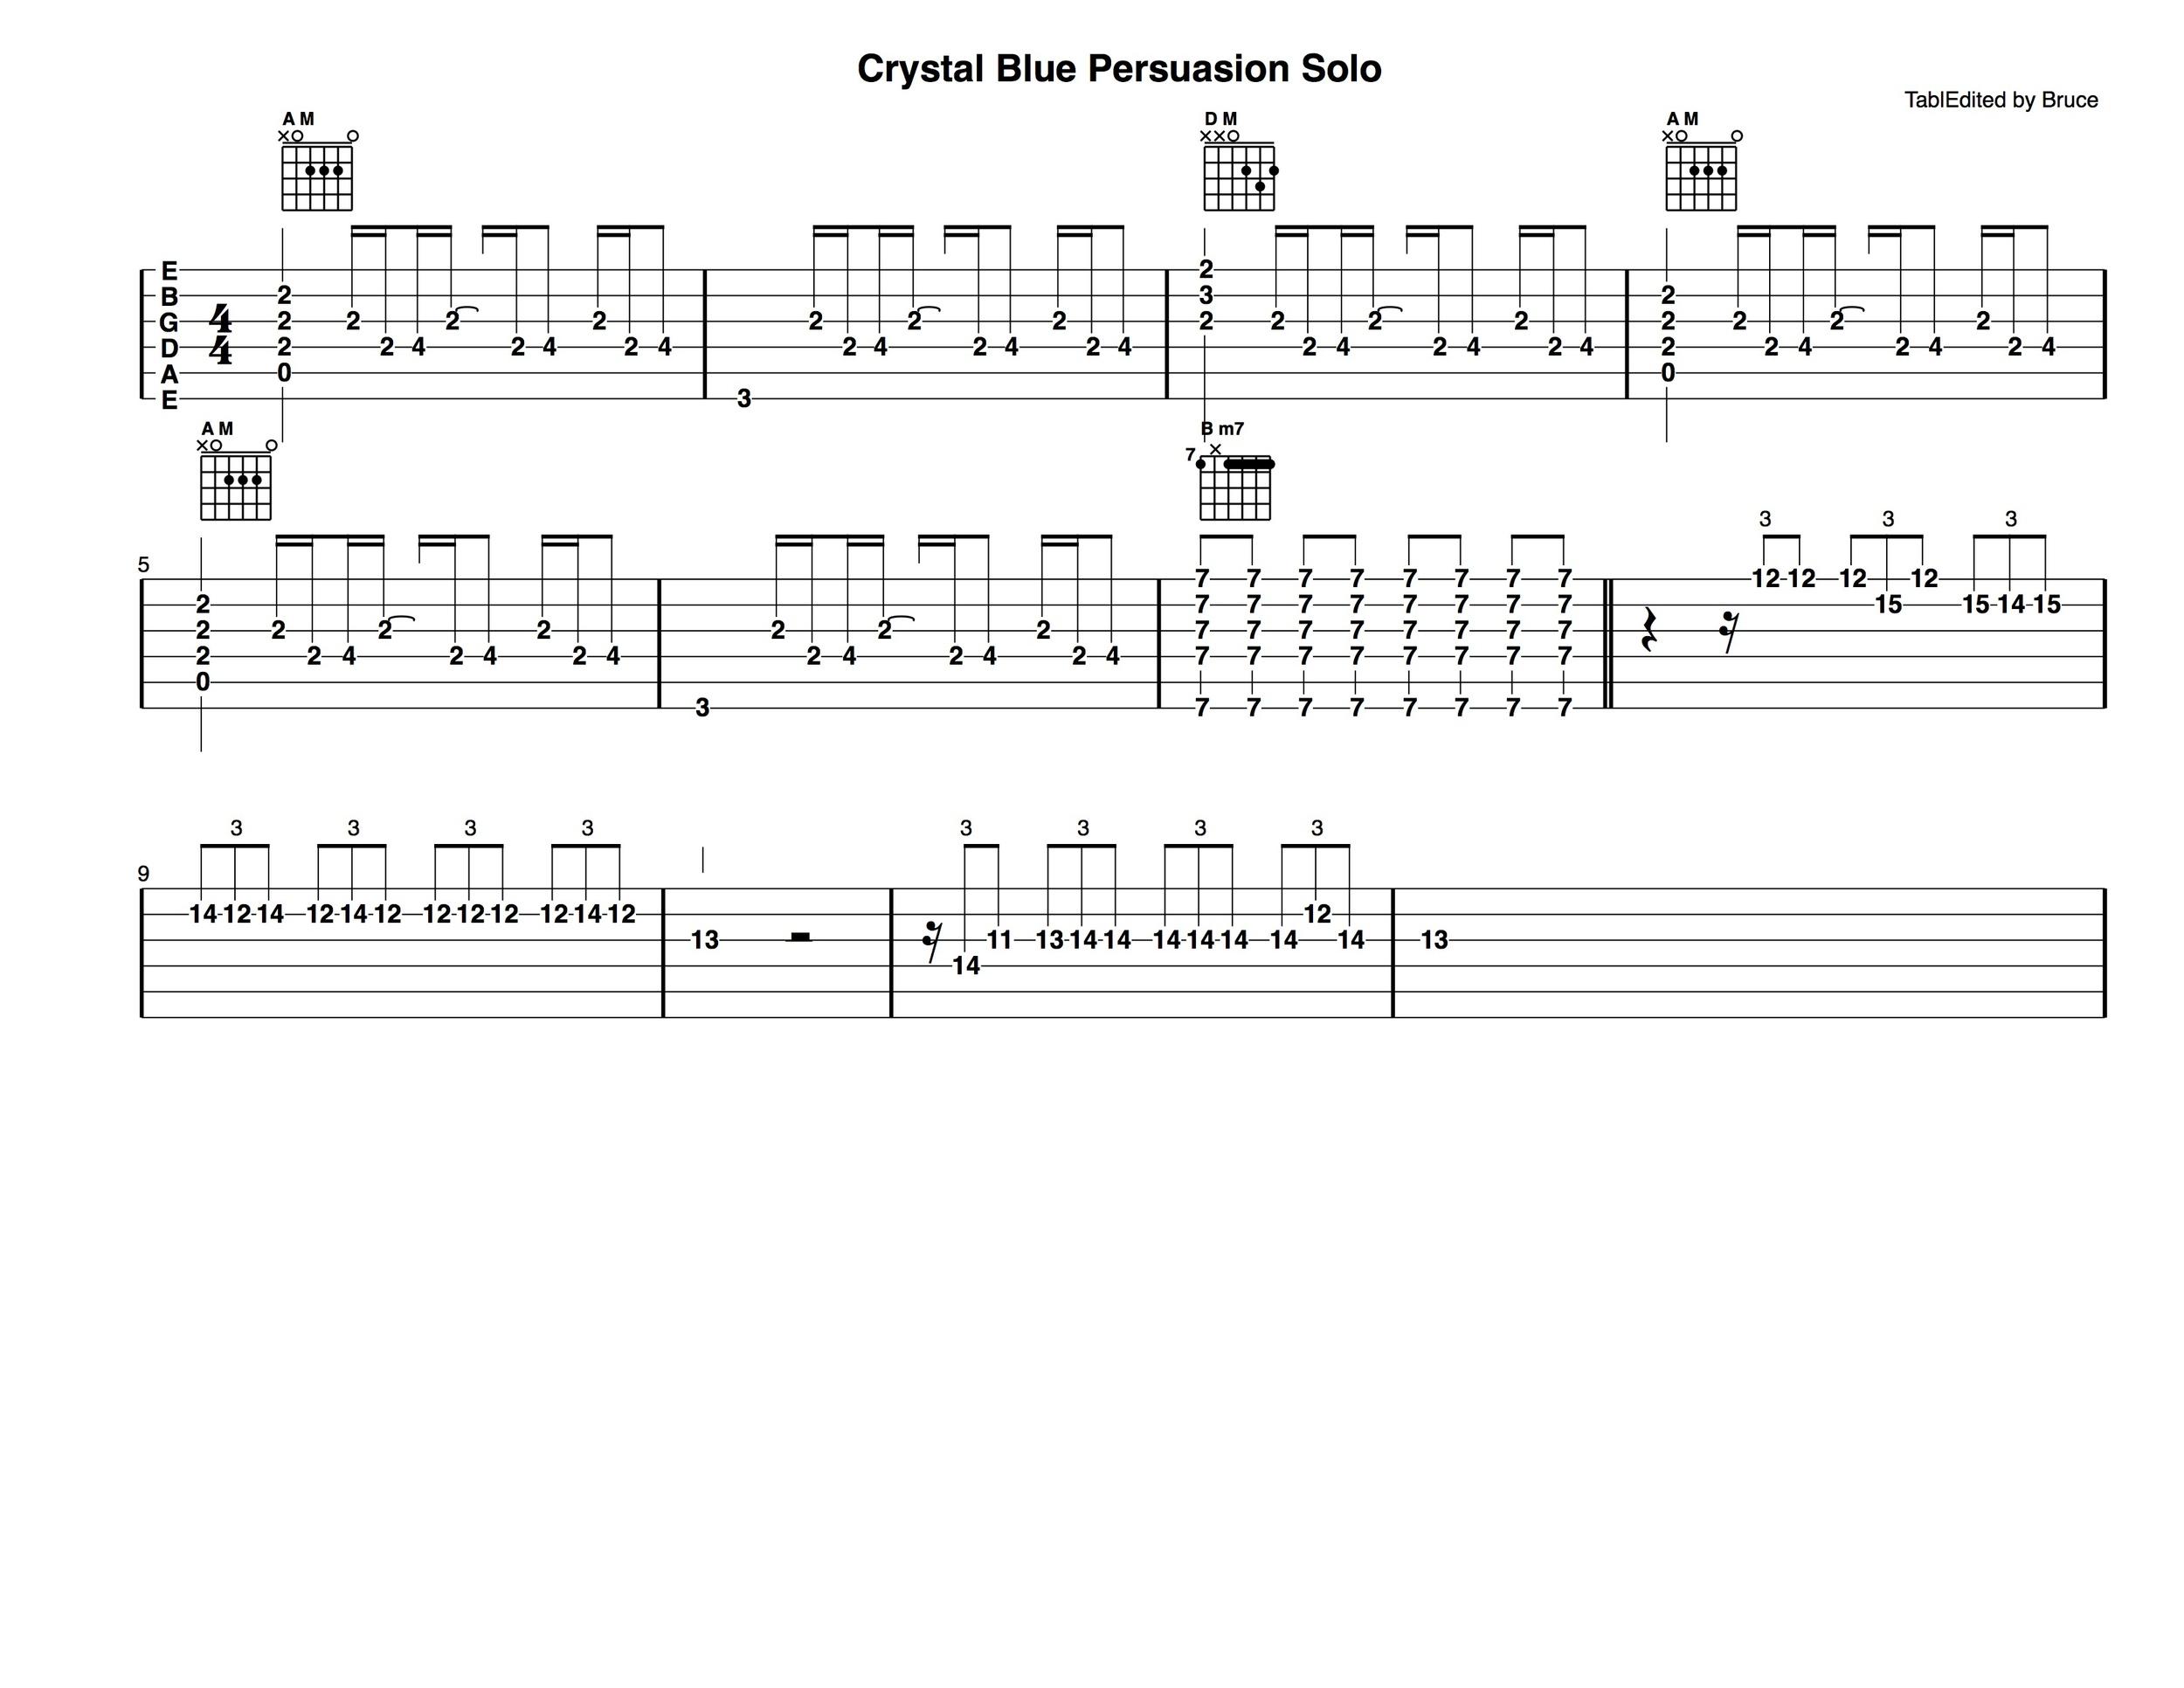 crystal_blue_persuasion_solo.jpg